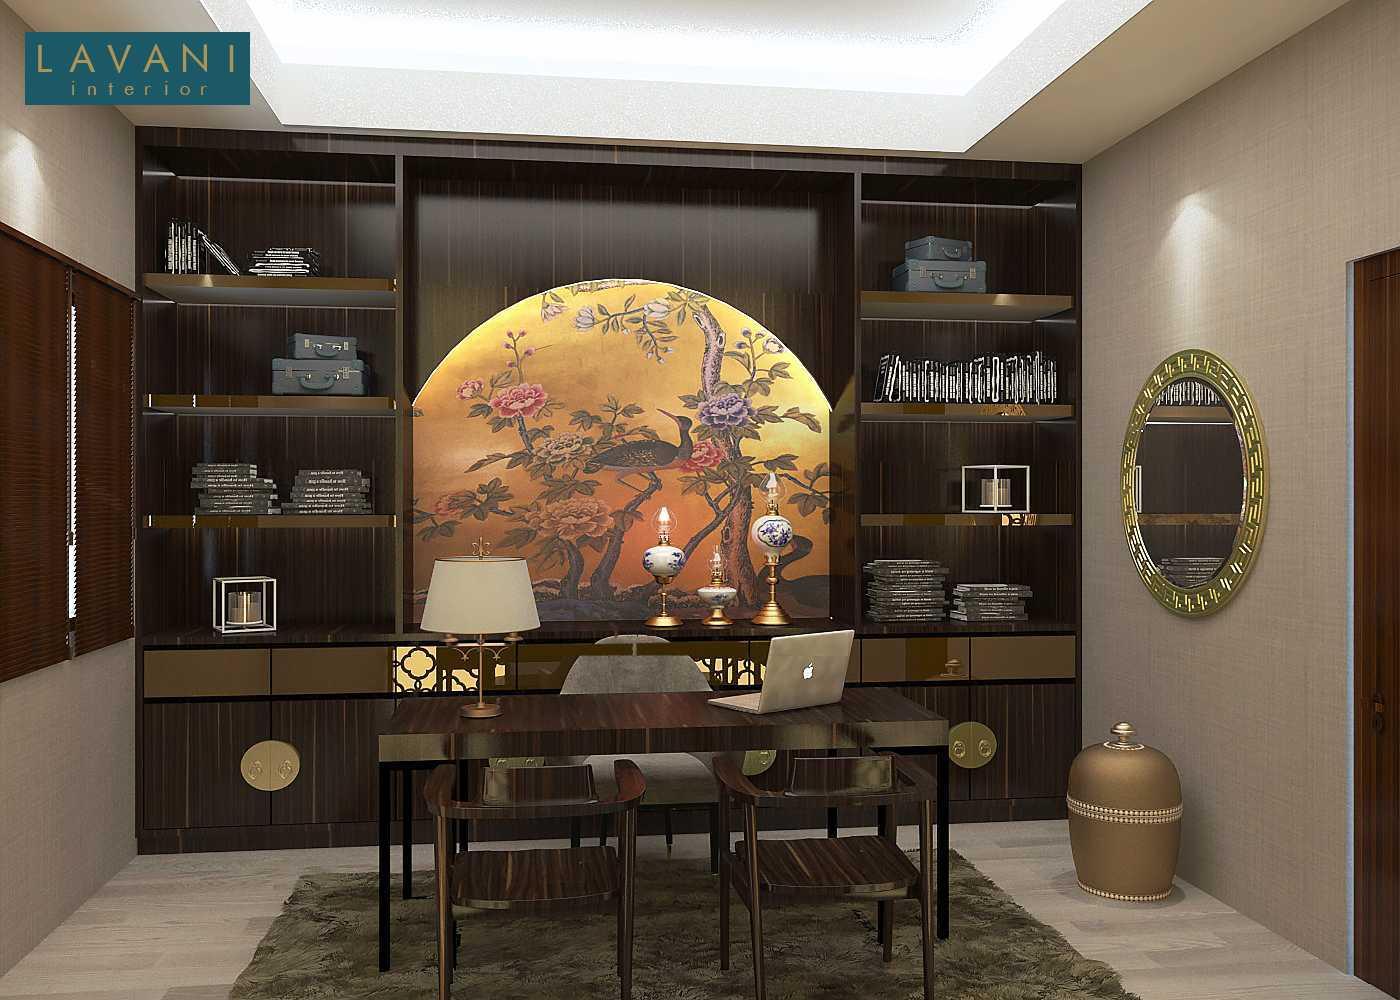 Lavani Interior Chinese Style Work Room Surabaya, Kota Sby, Jawa Timur, Indonesia Surabaya, Kota Sby, Jawa Timur, Indonesia Lavani-Interior-Chinese-Style-Work-Room  53509